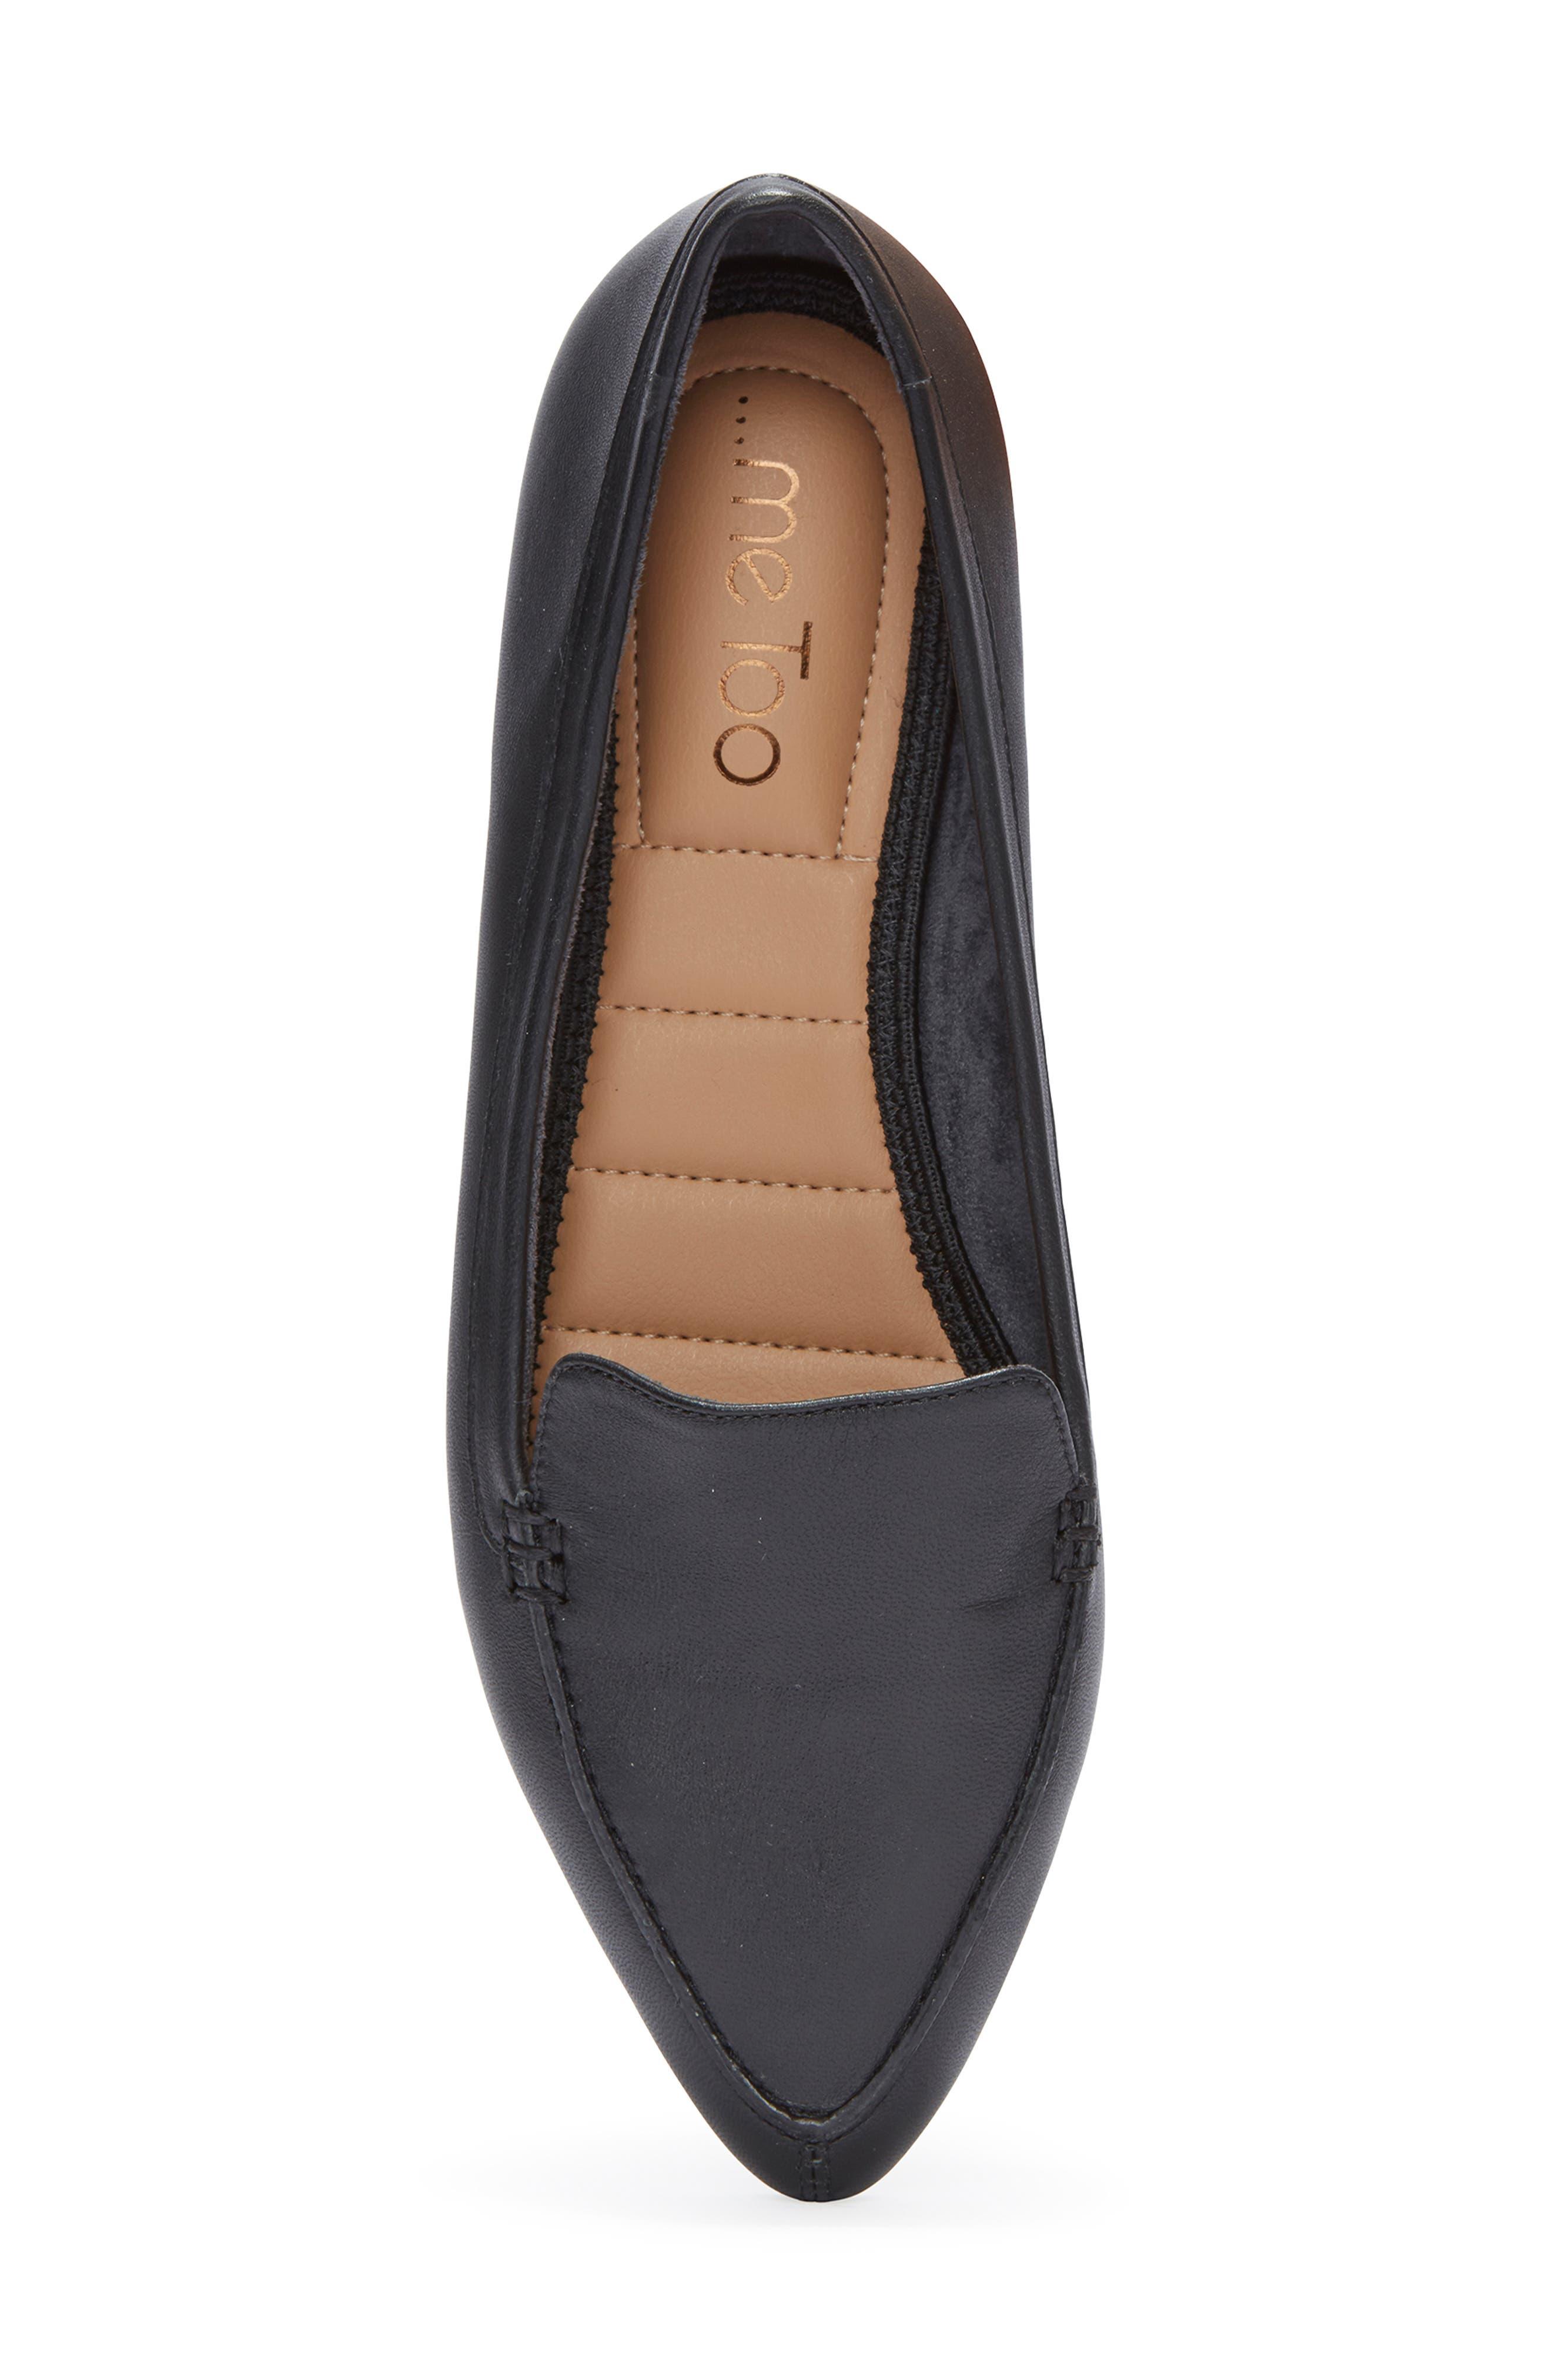 Audra Loafer Flat,                             Alternate thumbnail 5, color,                             BLACK/ BLACK LEATHER